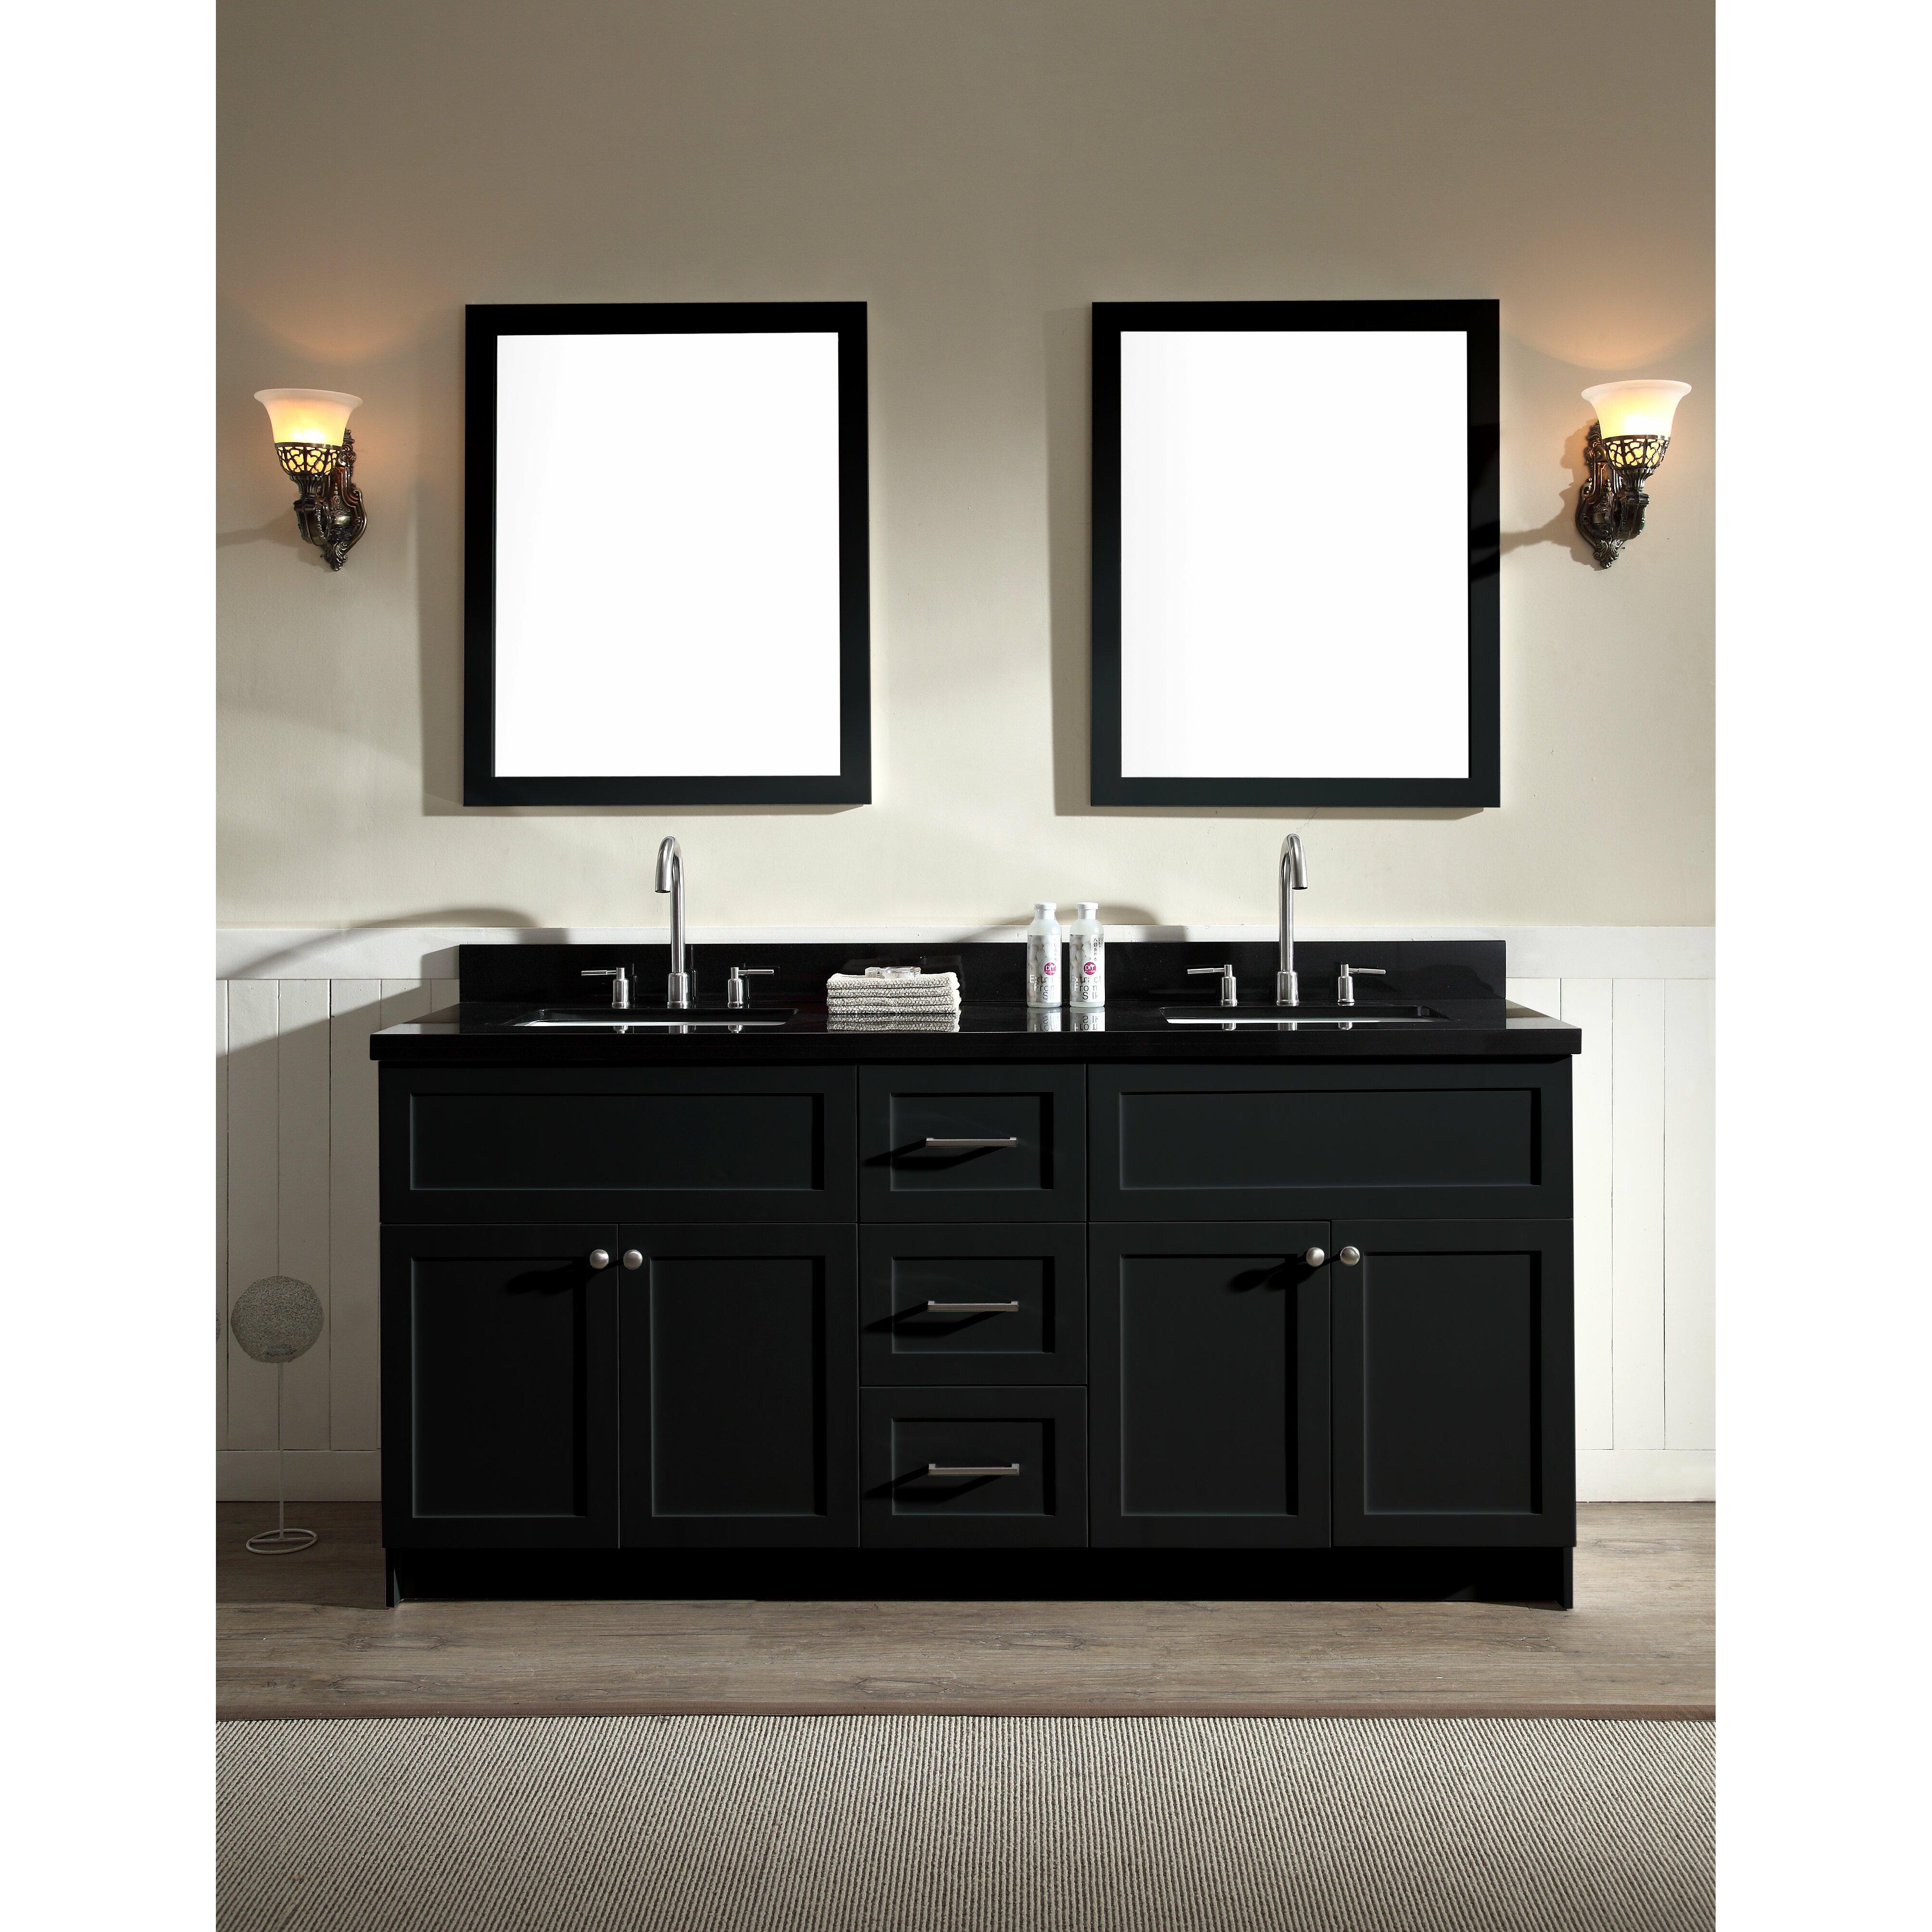 Ariel Bath Hamlet 73 Double Bathroom Vanity Set With Mirrors Reviews Wayfair